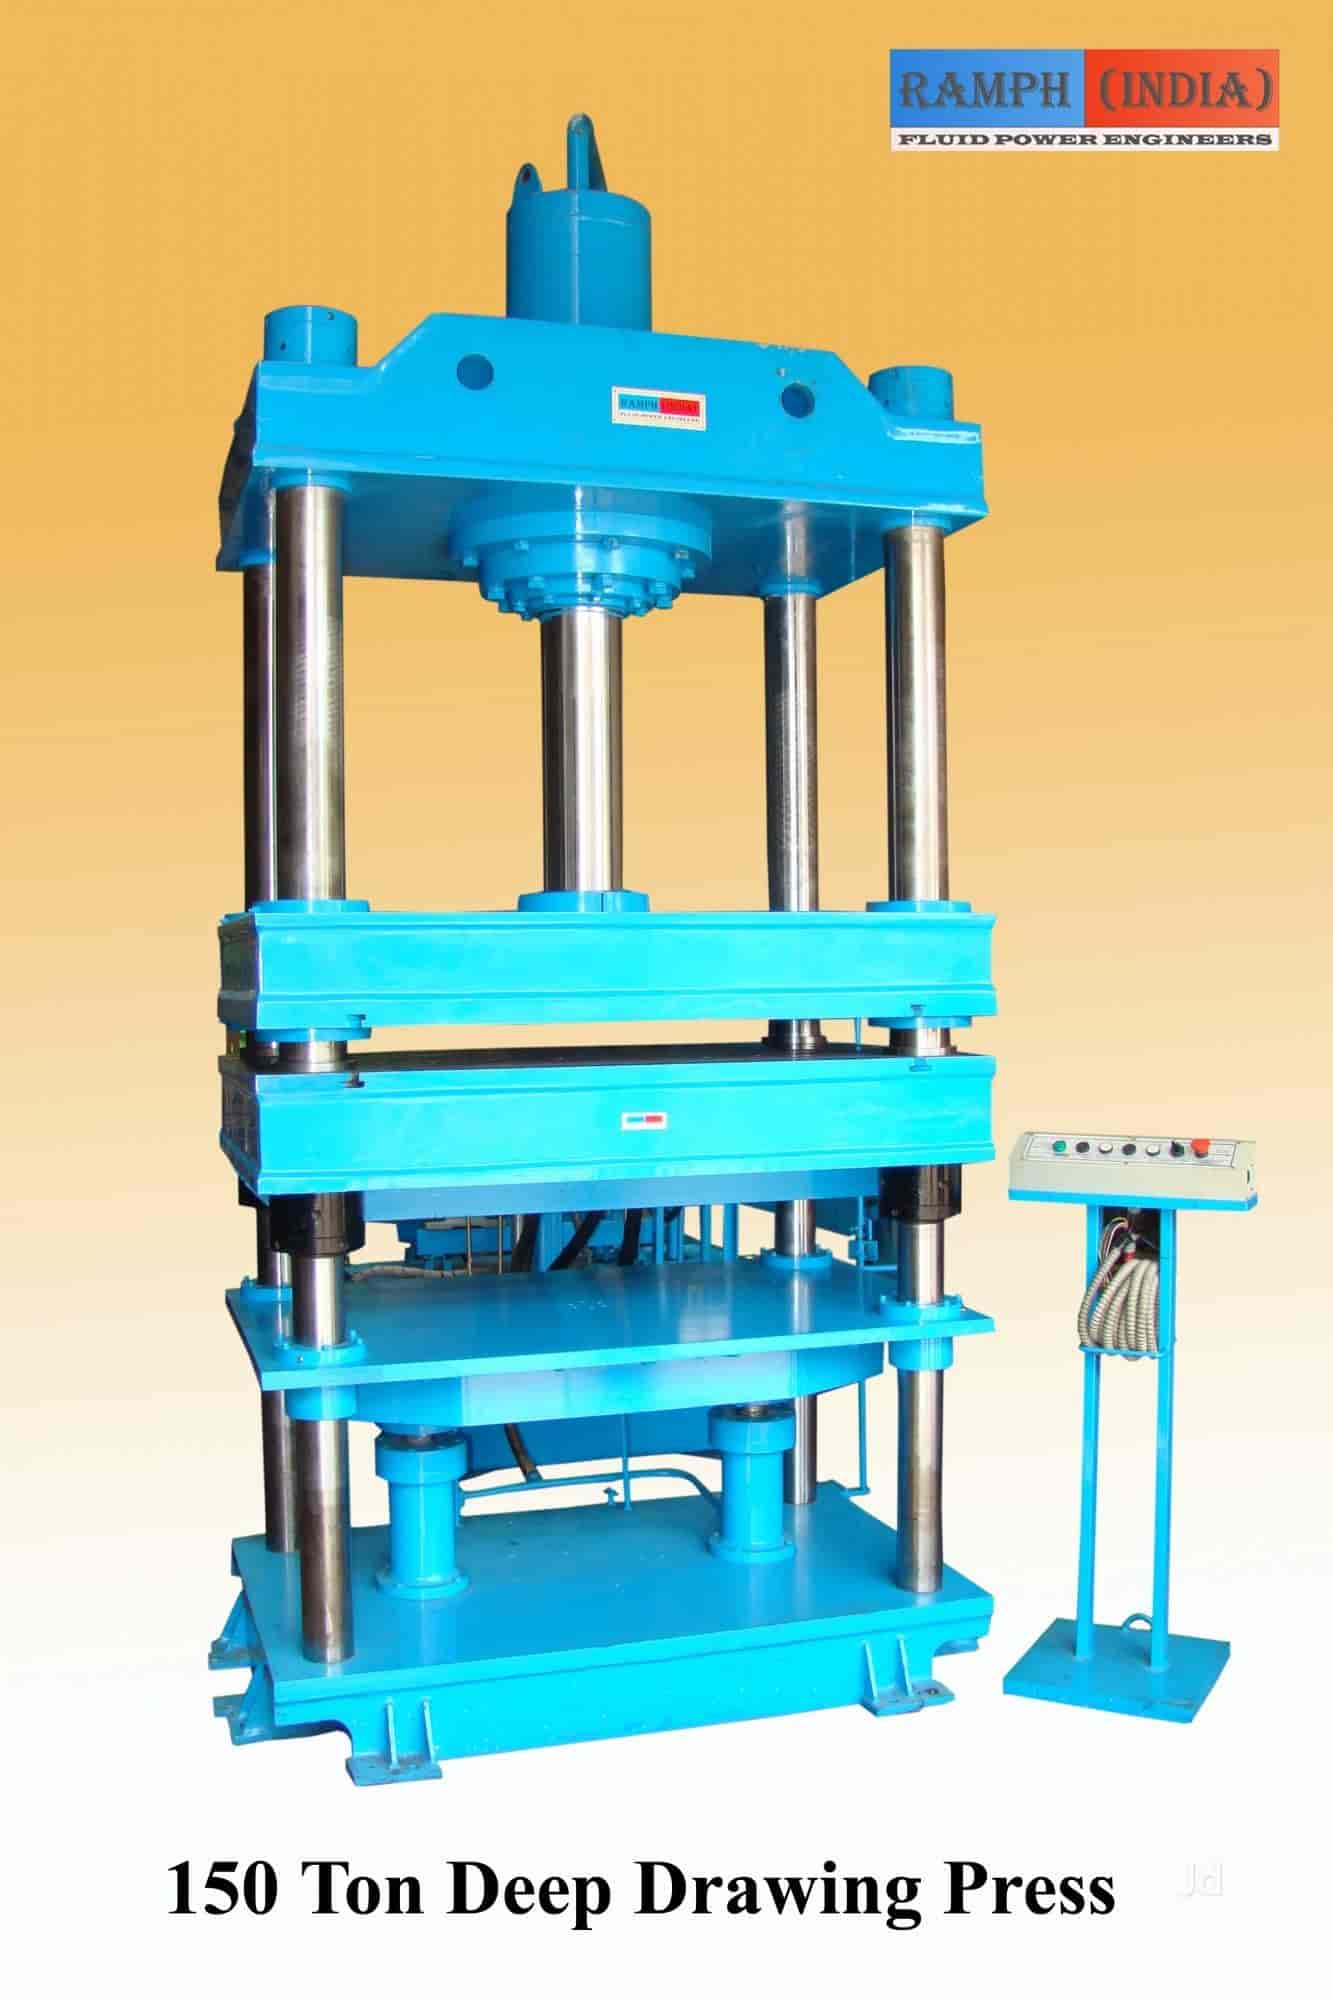 Ramph India, Peenya Industrial Area - Hydraulic Equipment